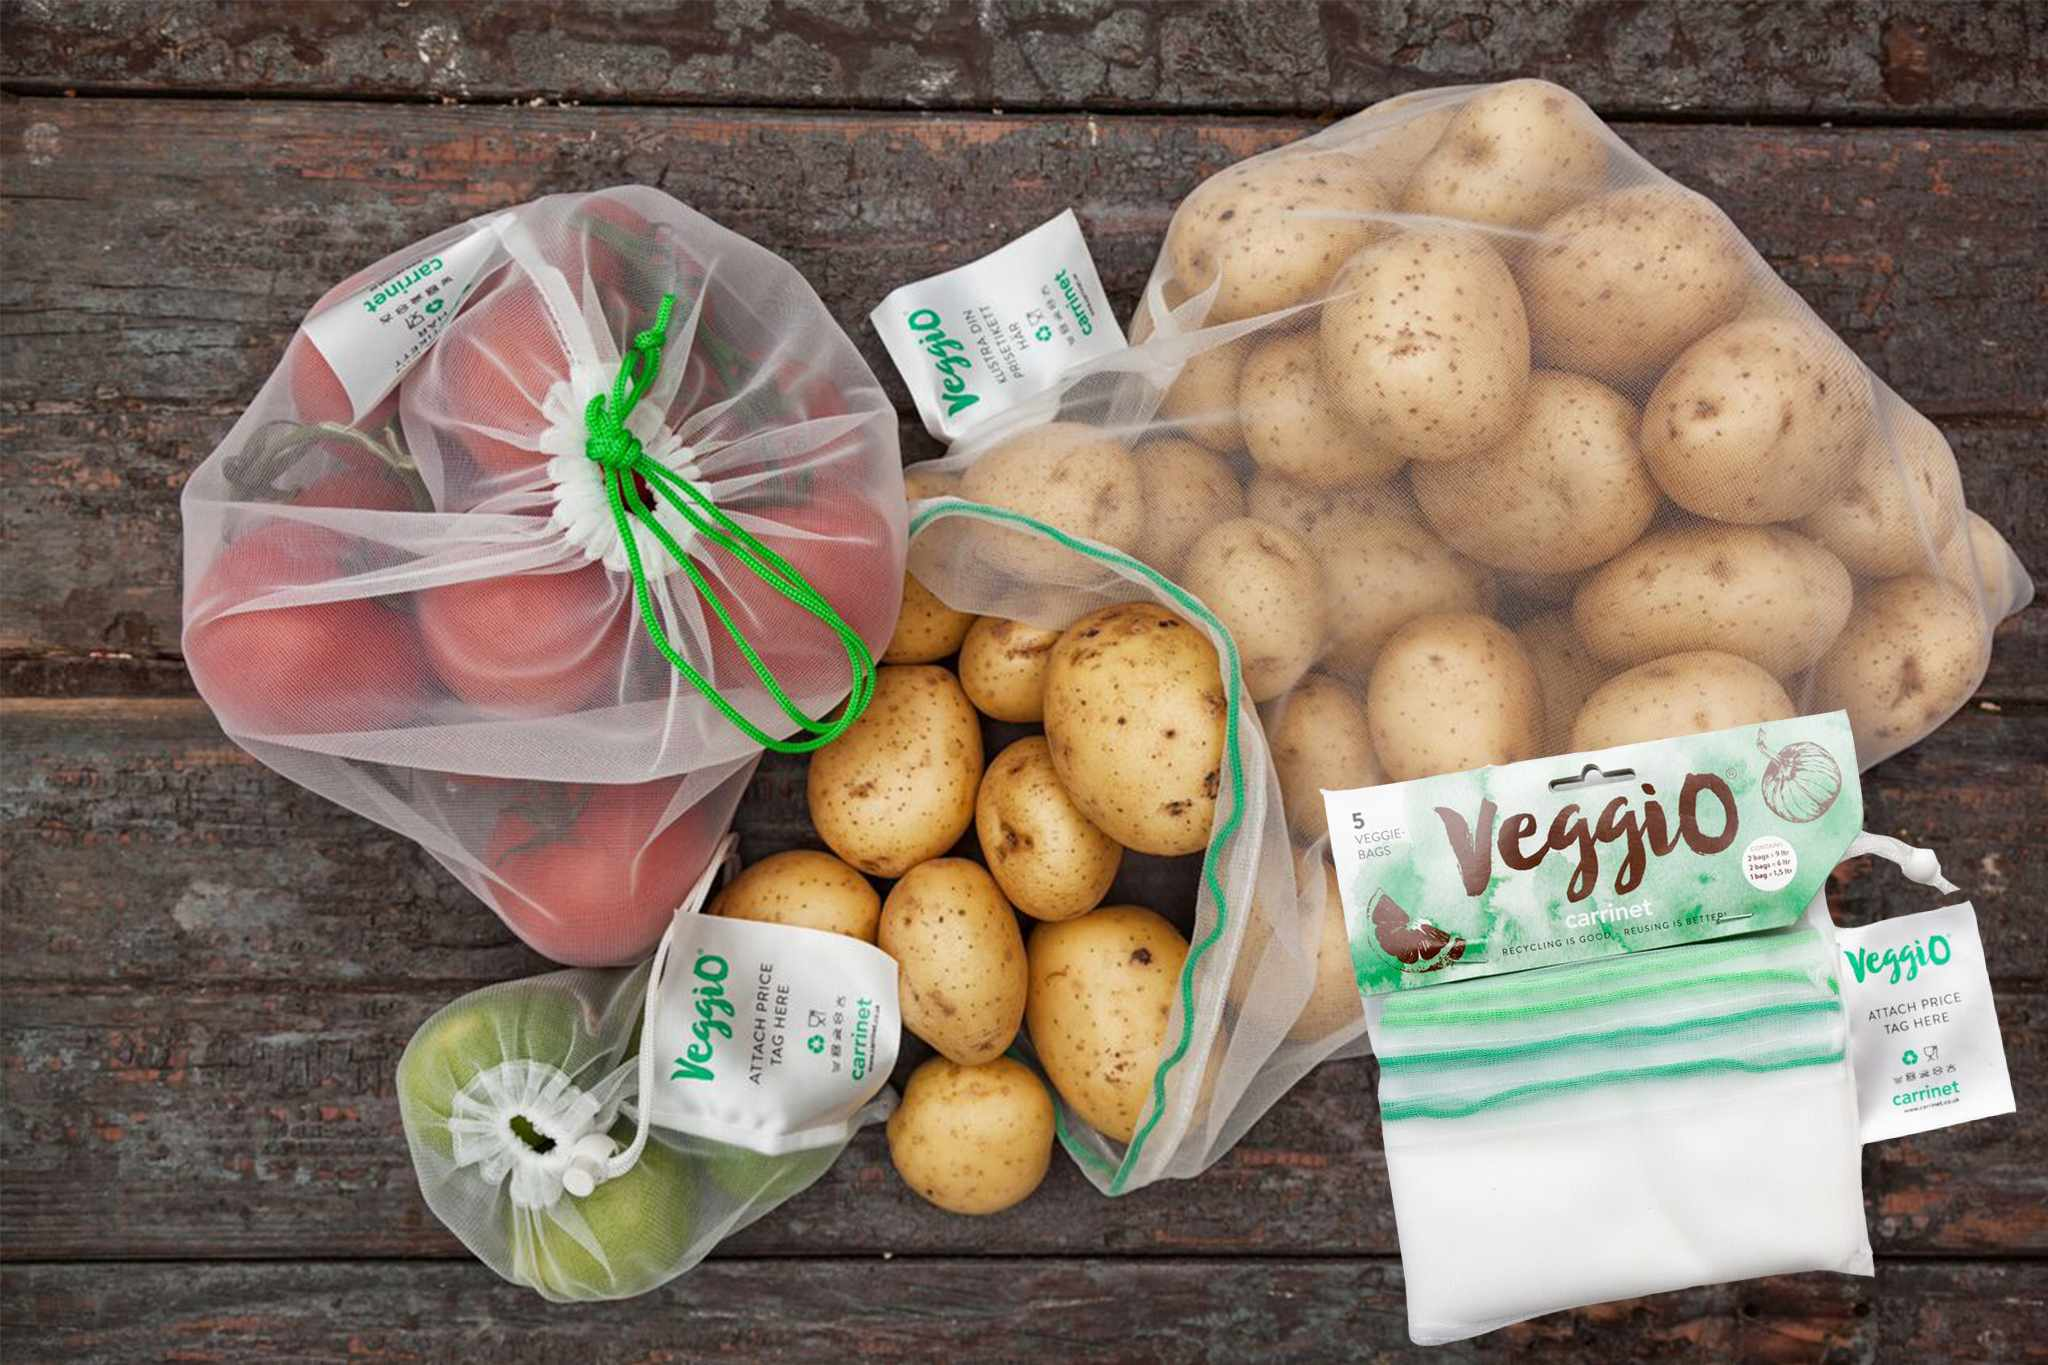 2tech-veggio-bags-free-pandp-2048-1365